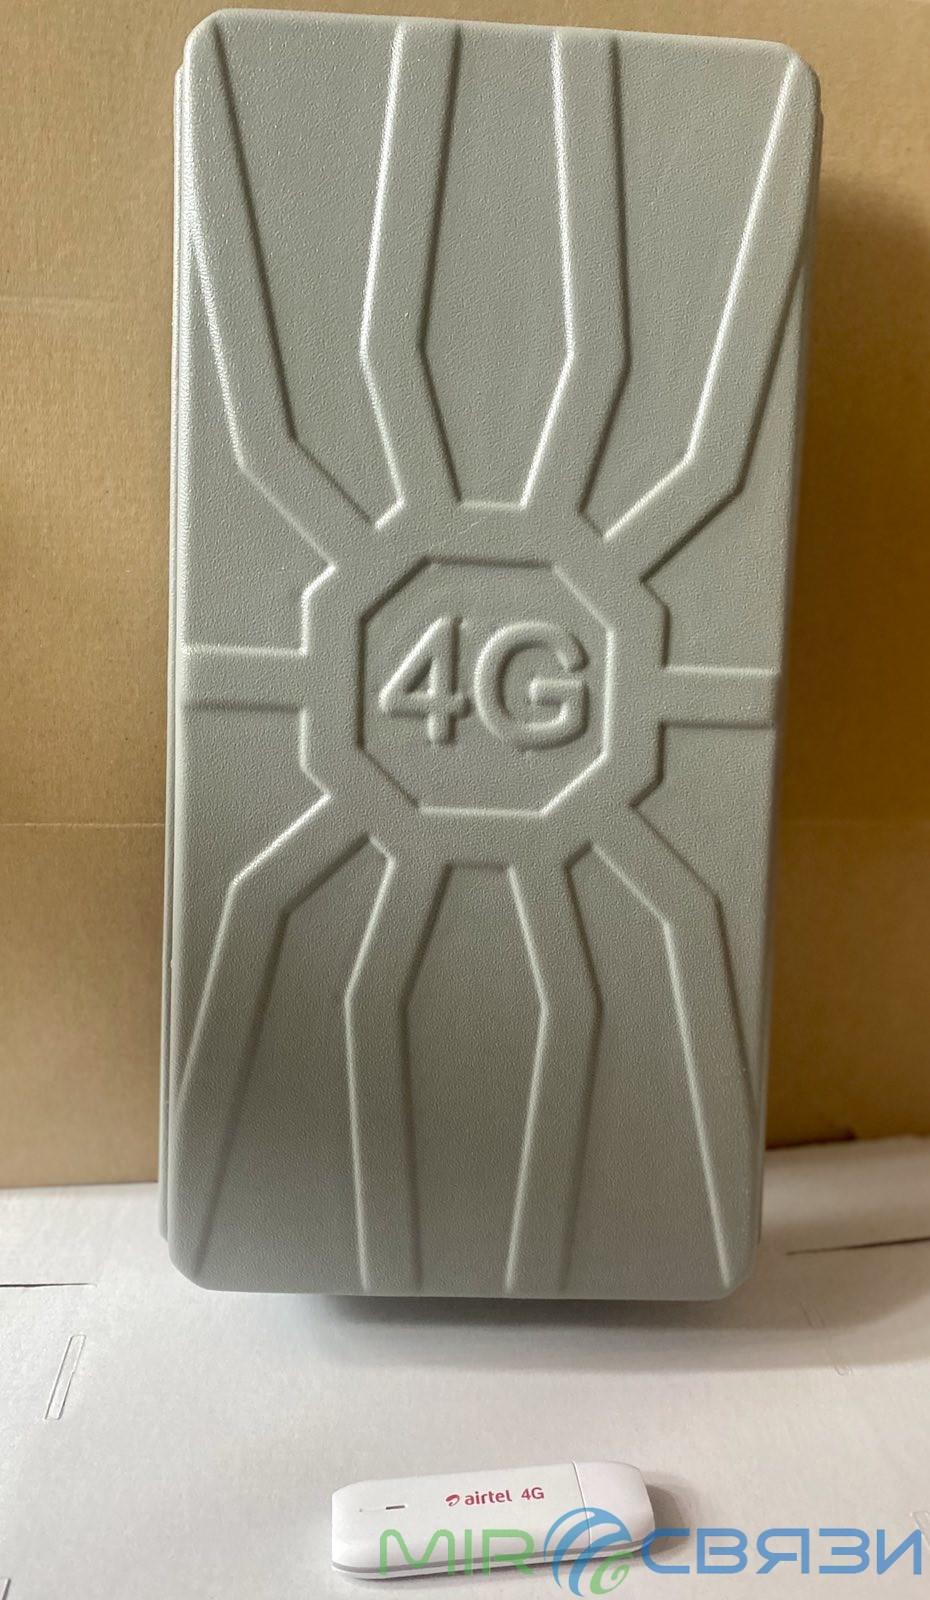 Spider 2х16 dBi панельная MIMO антенна 3G/4G Runbit